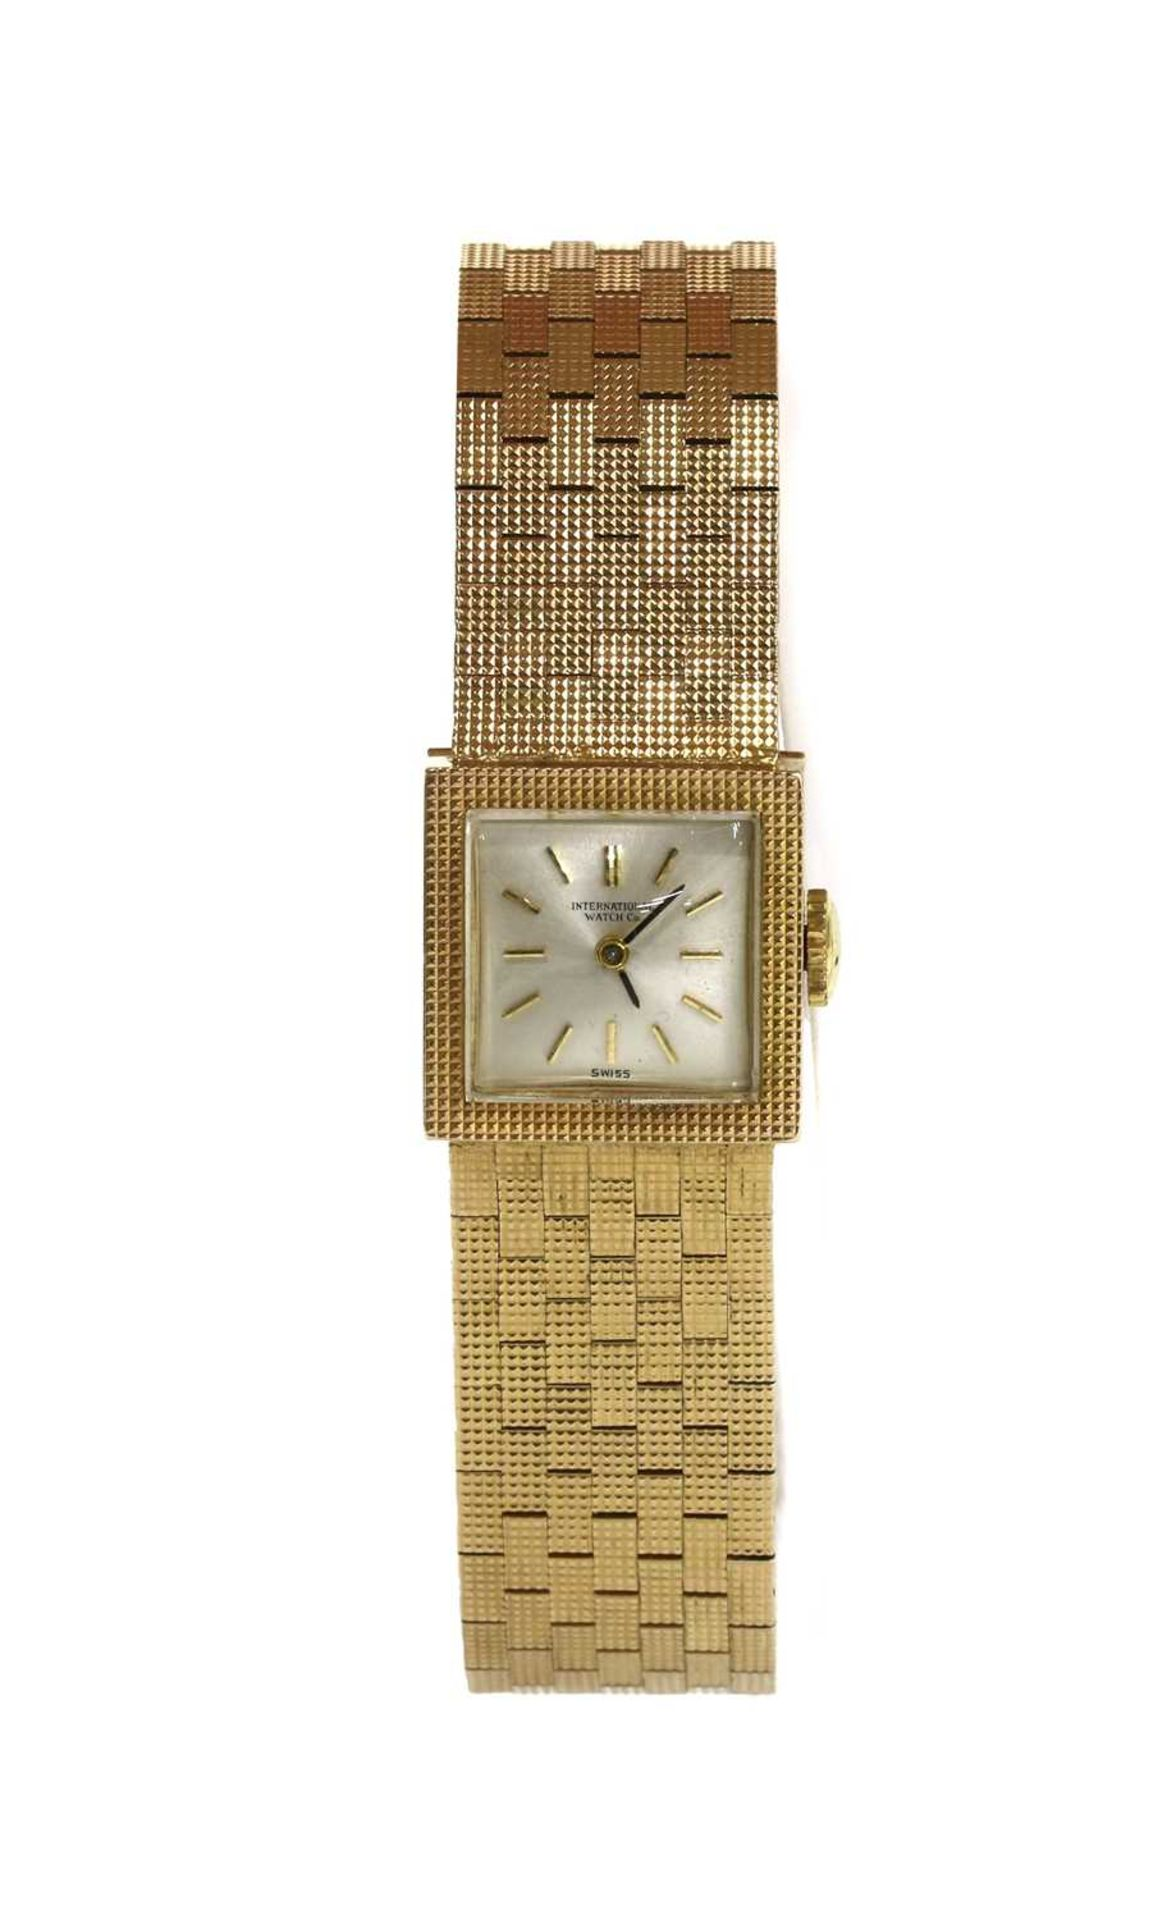 A ladies' 9ct gold International Watch Company mechanical bracelet watch,